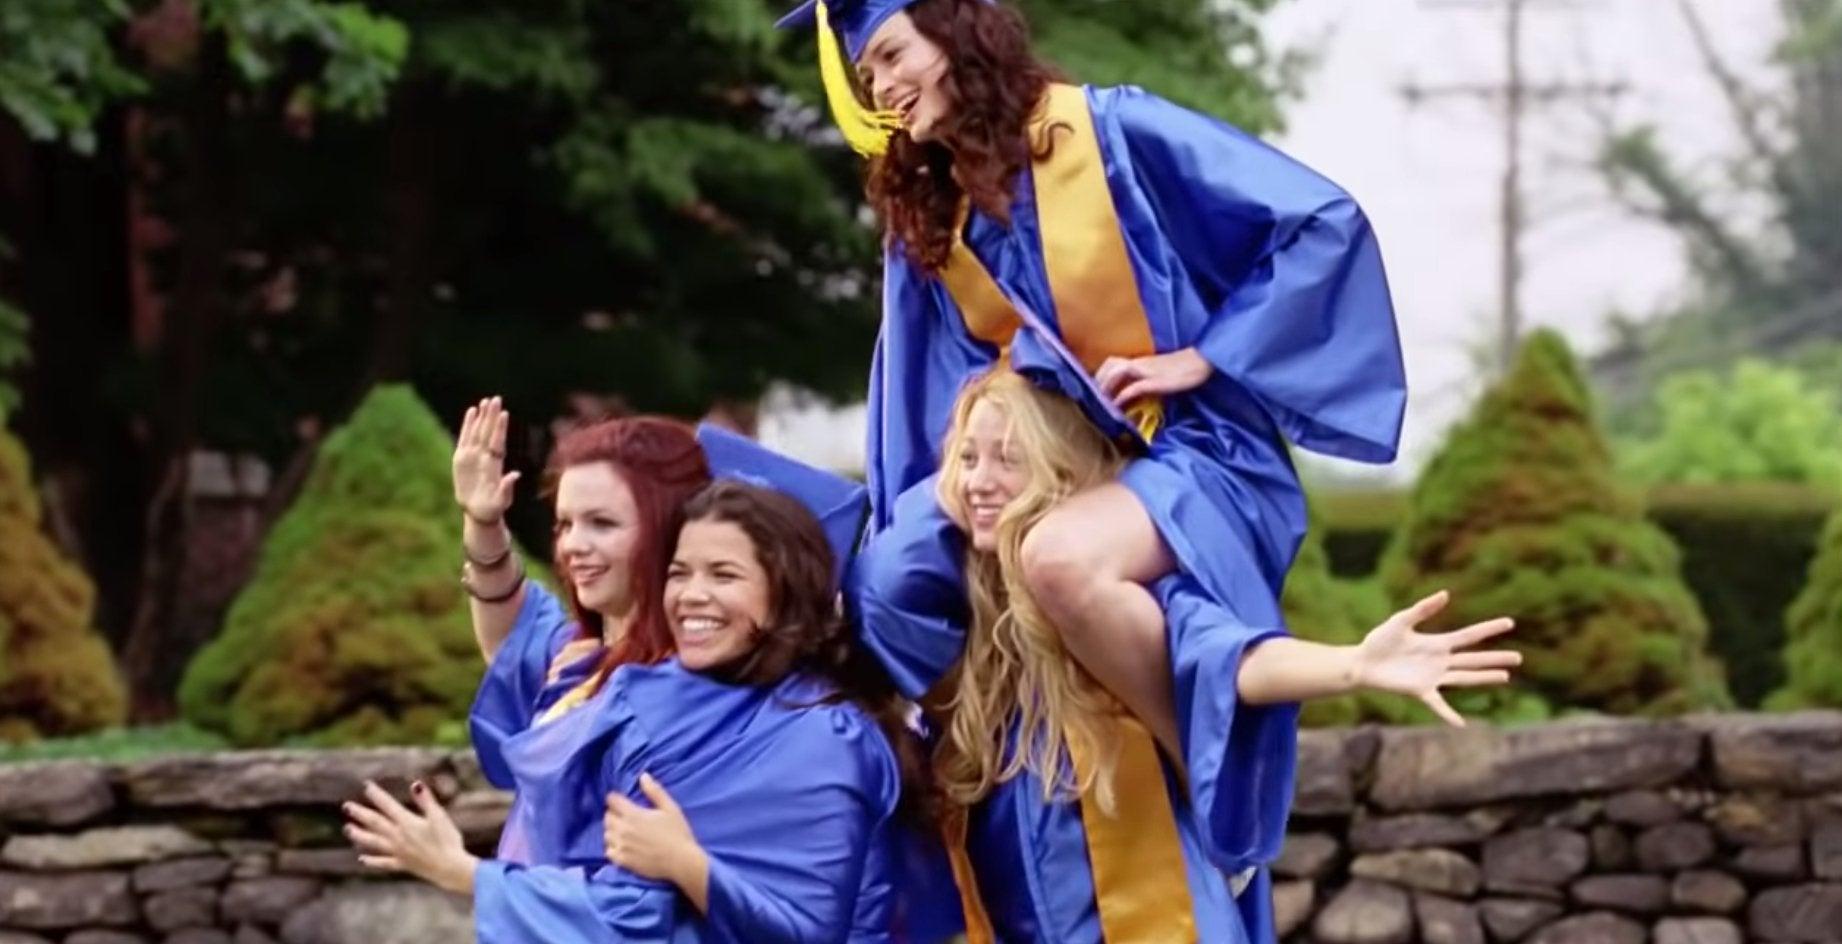 The Sisterhood of the Traveling Pants graduation scene